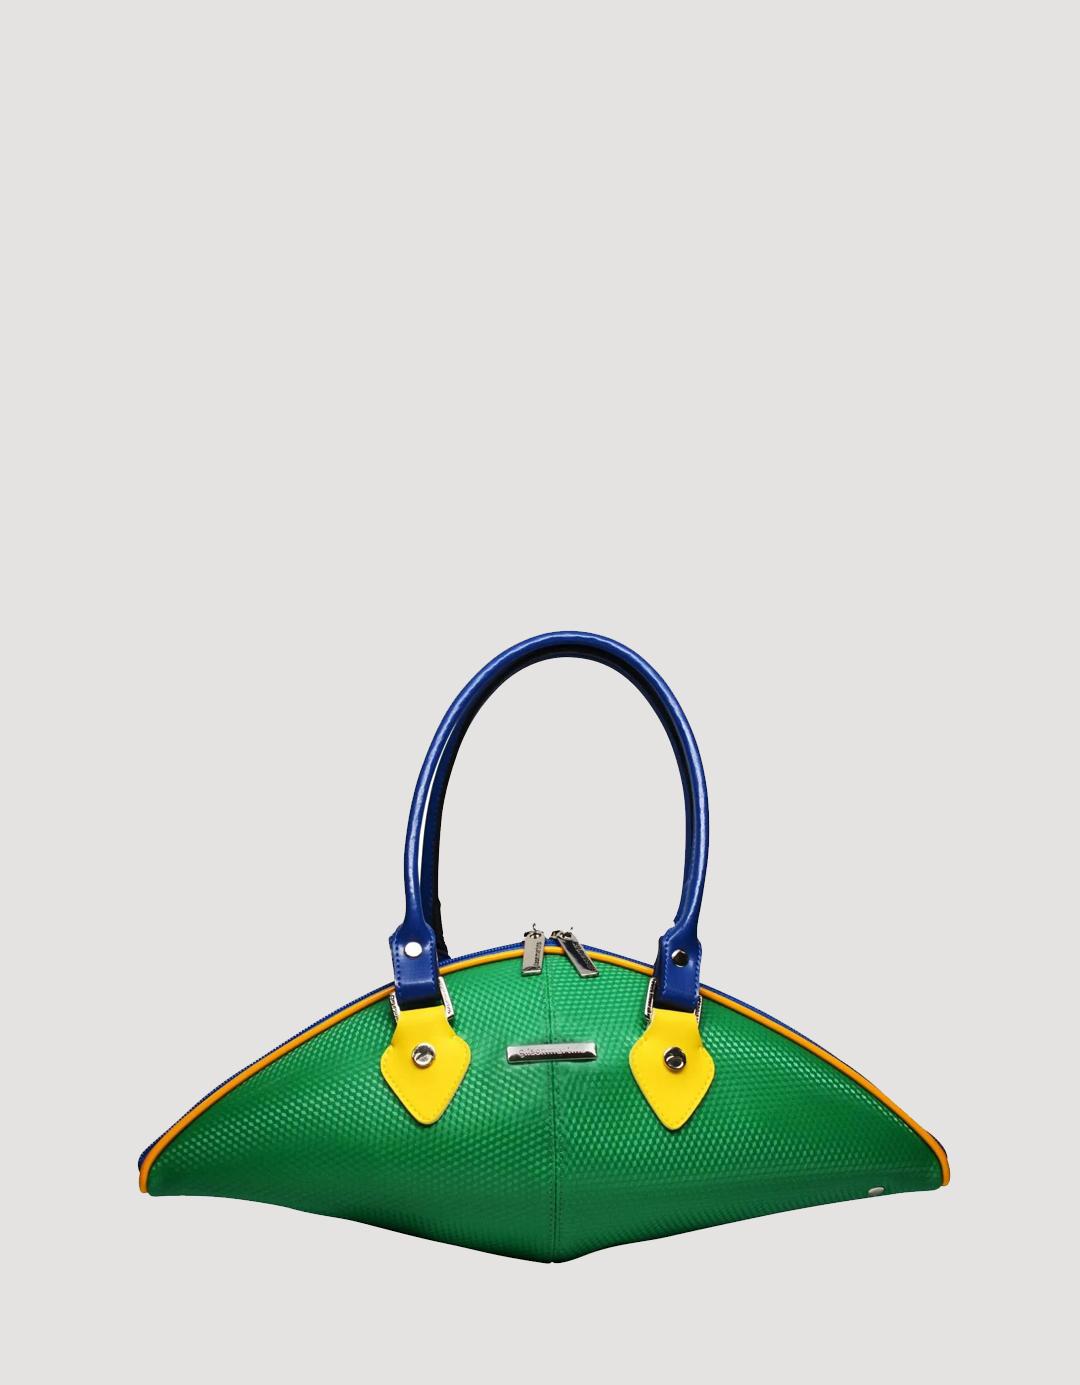 Bolsa Baguette Verde Exclusiva Balão